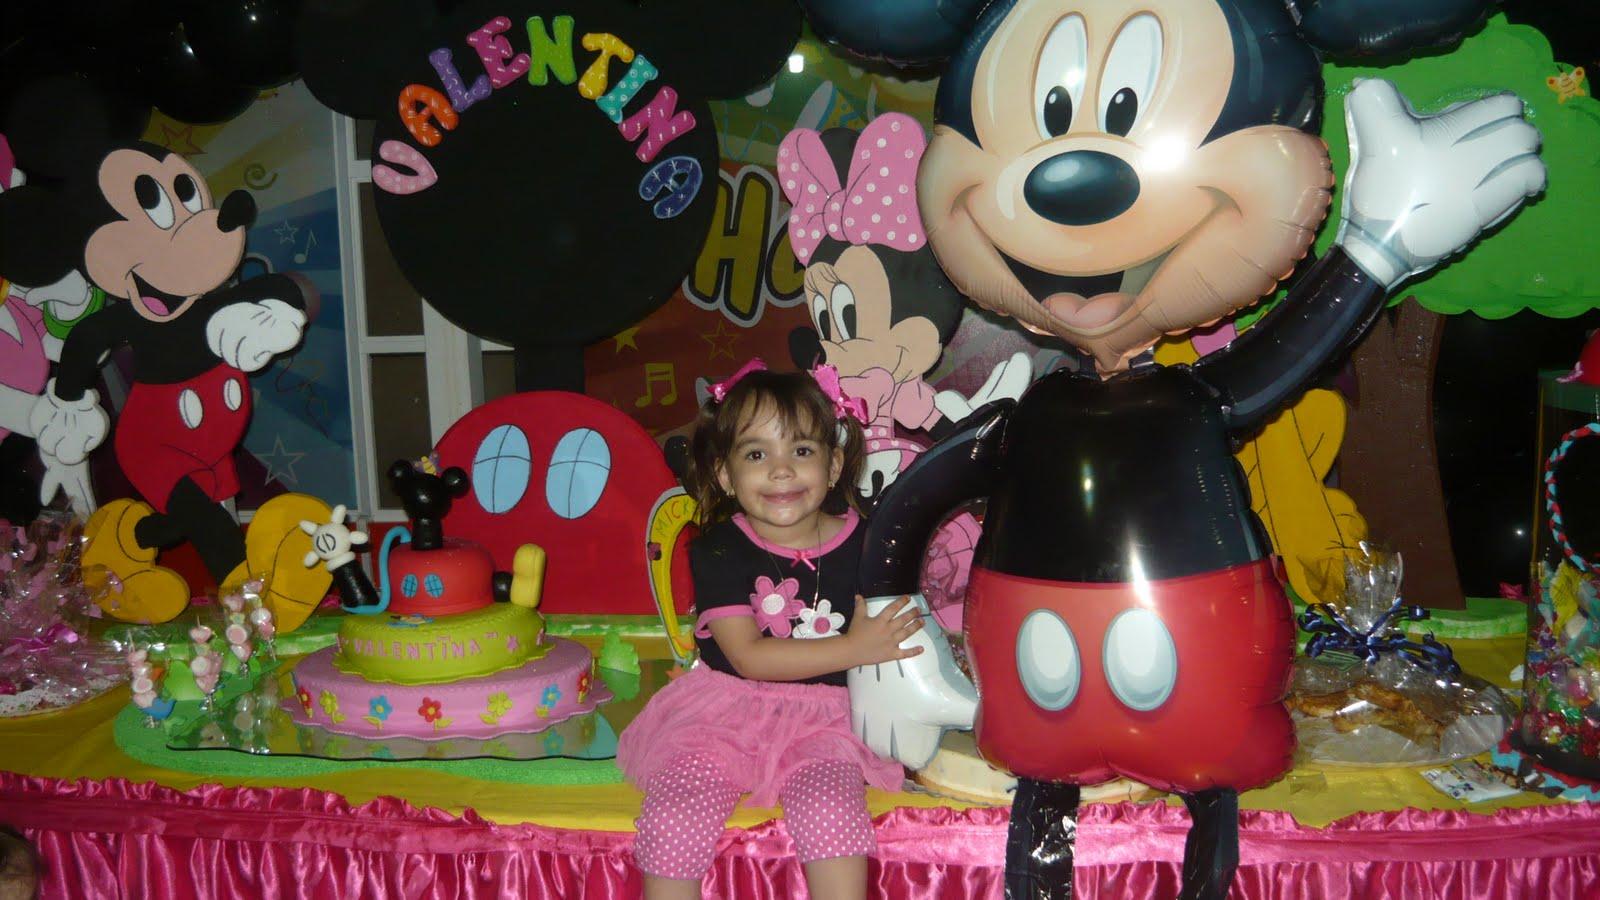 D 39 koeventos cumplea os infantil de la casa de mickey mouse - Cumpleanos infantil en casa ...